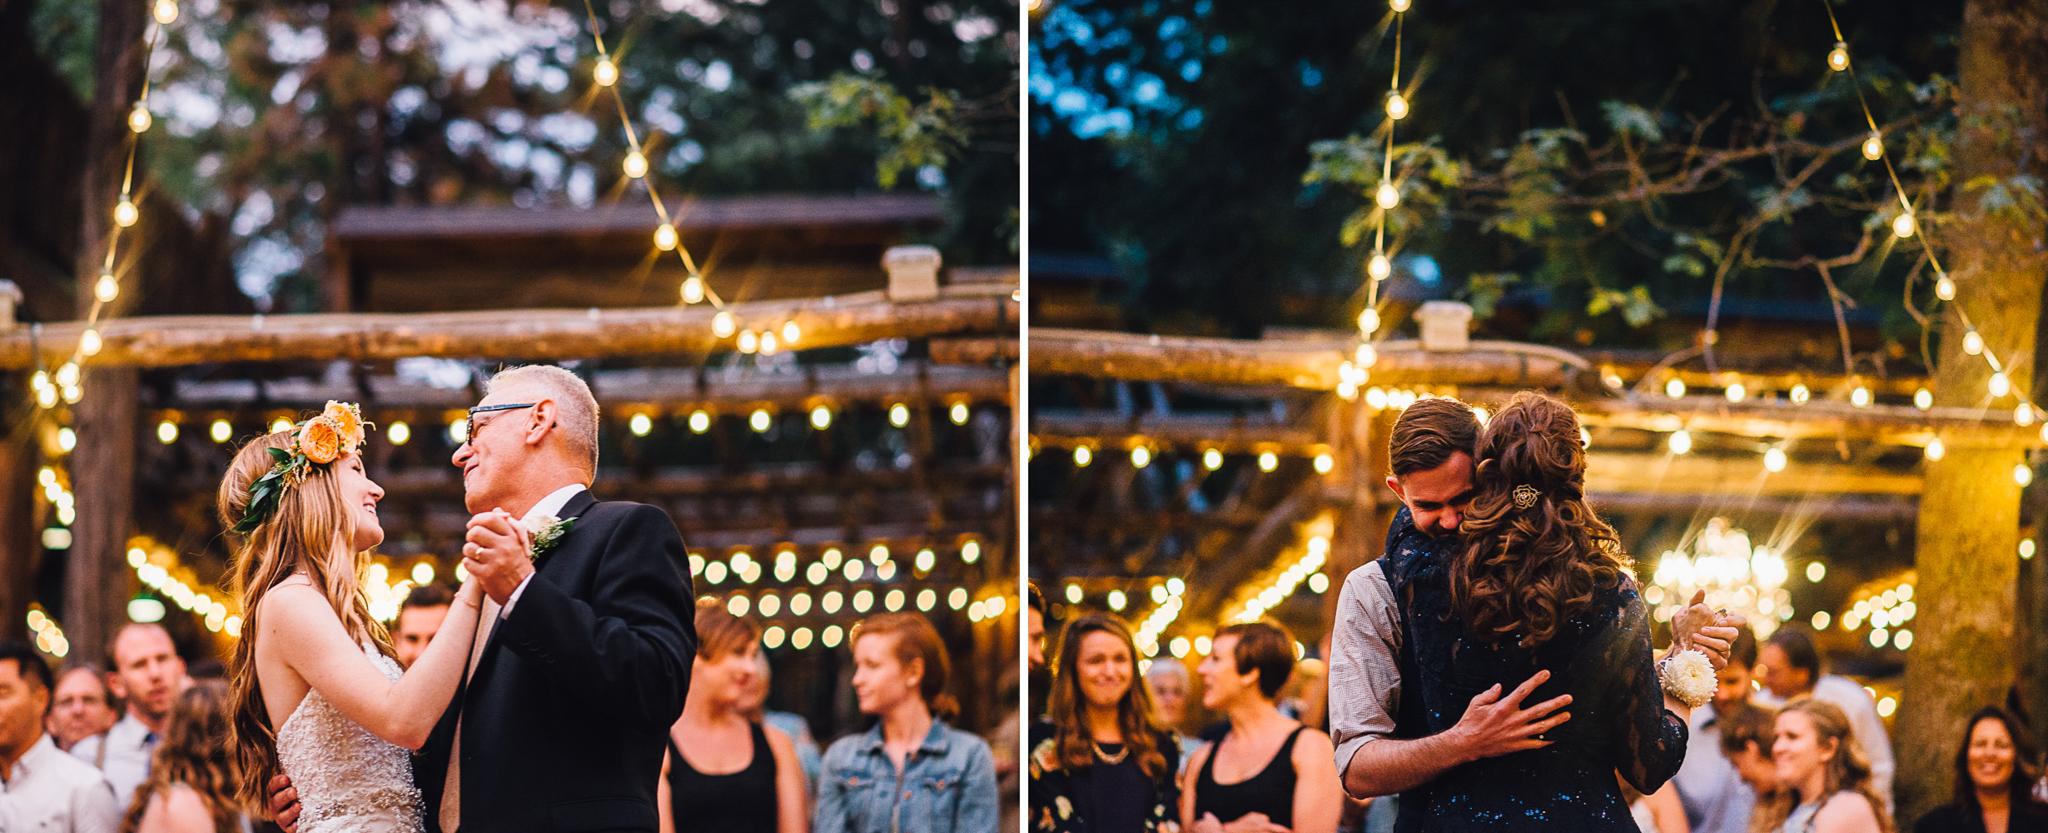 ©Isaiah & Taylor Photography - Pine Rose Cabin - Lake Arrowhead - Los Angeles Wedding Photographer-135.jpg